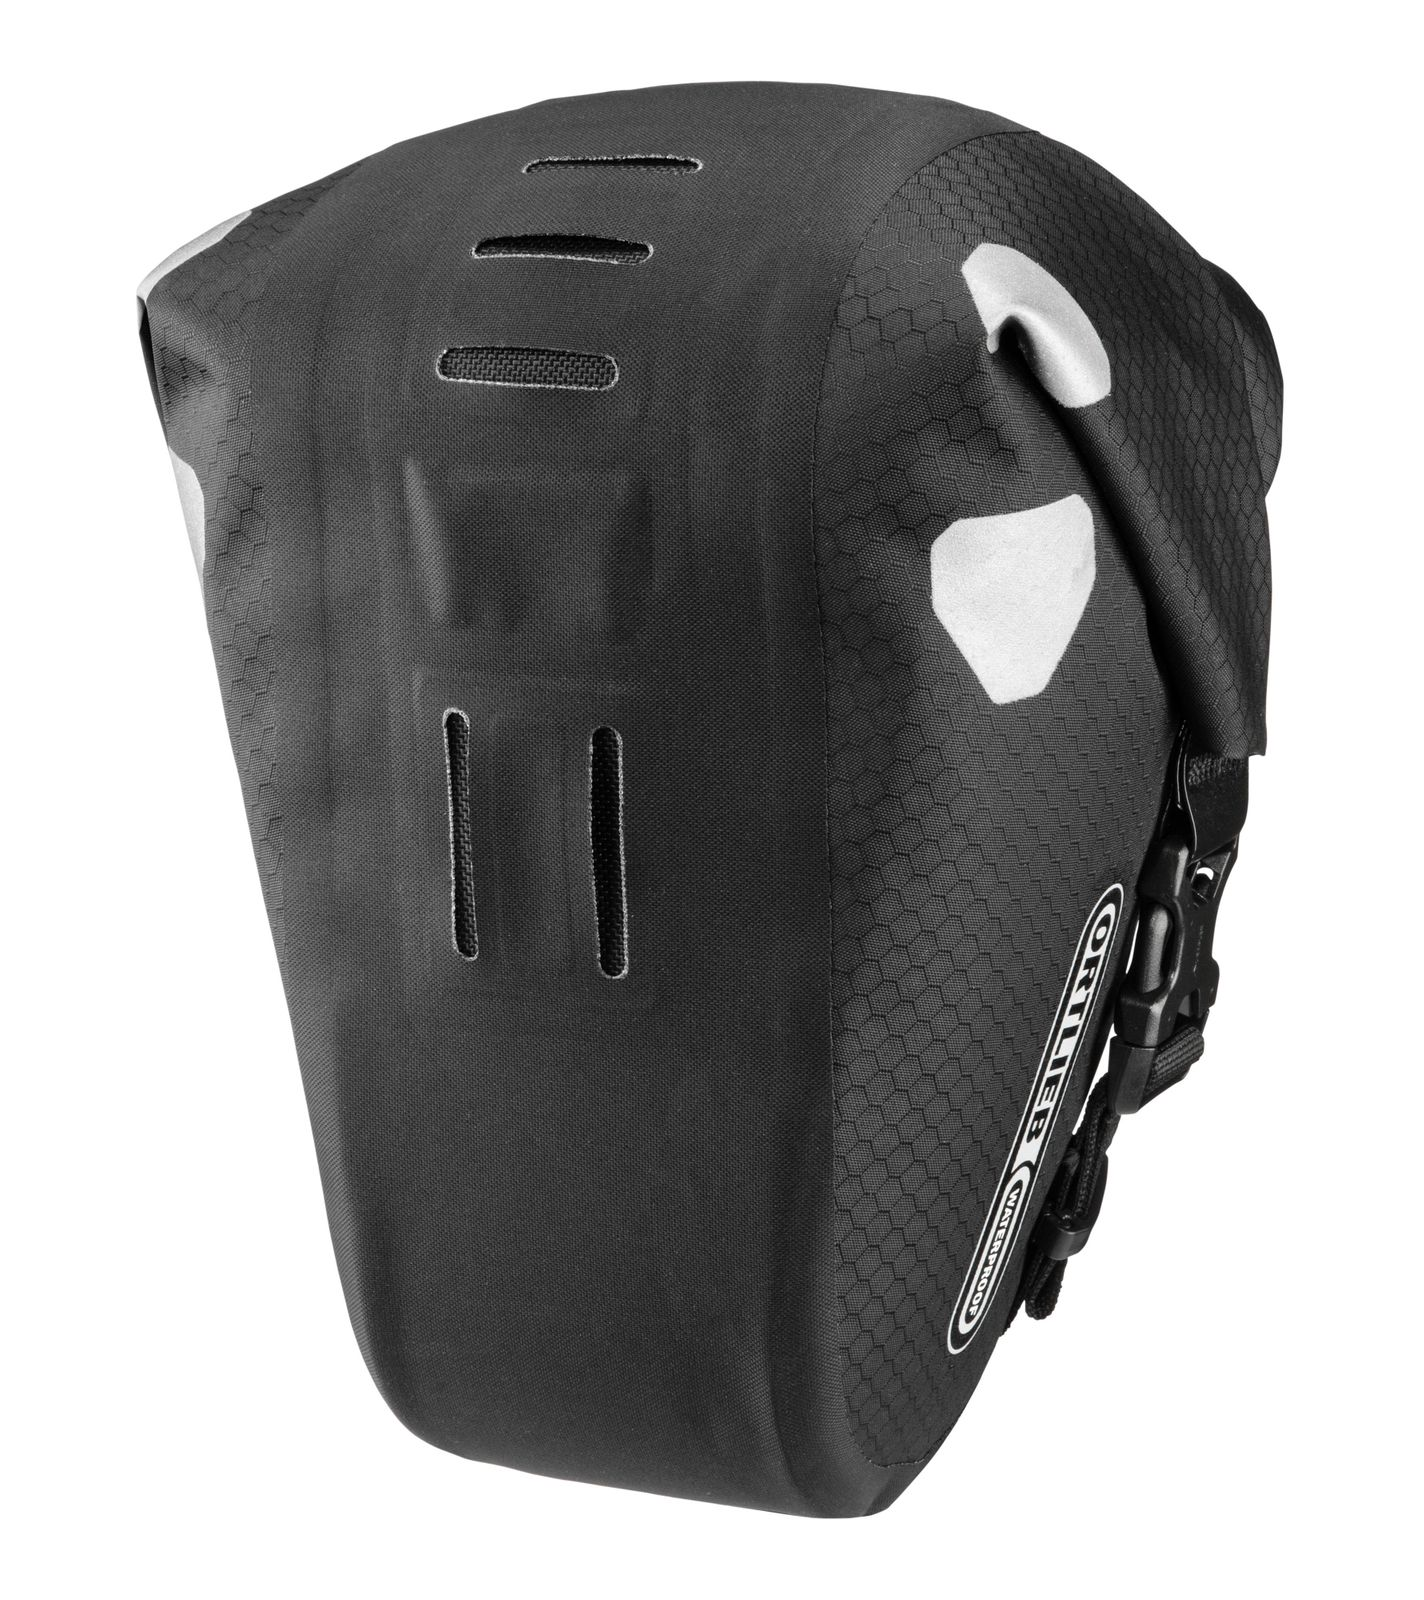 ORTLIEB Sport Cycling Saddle-Bag Two Bike Saddle Bag 1,6L Black Matt